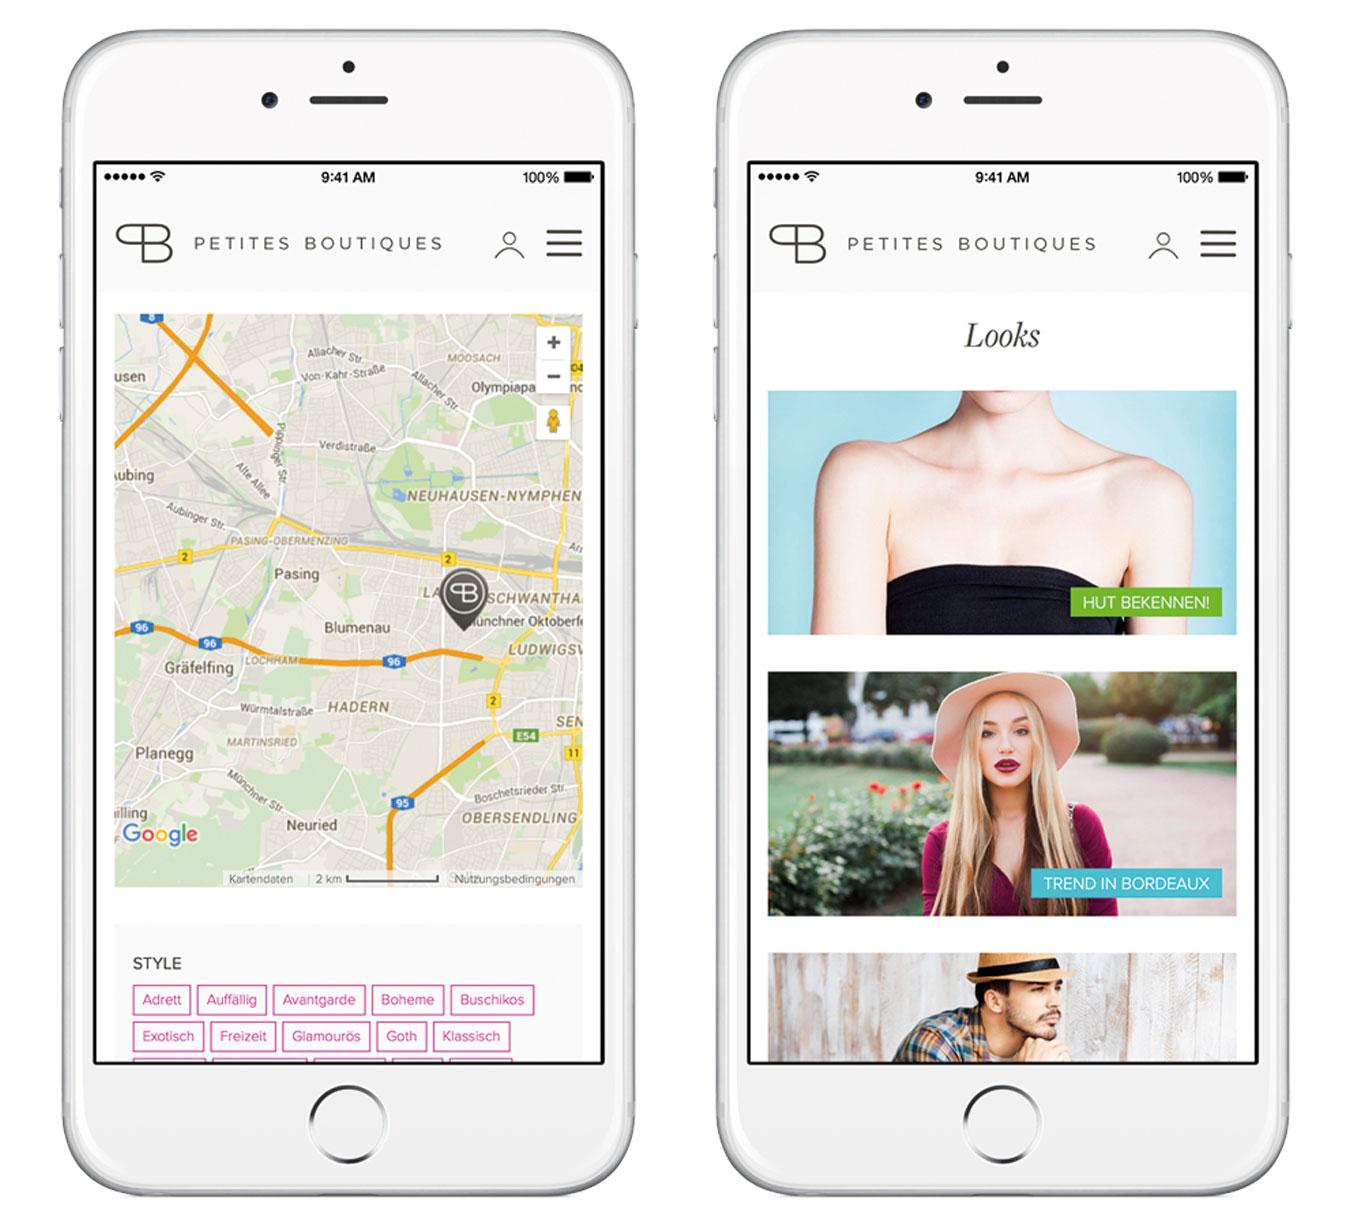 Screenshots of the Petites Boutiques App